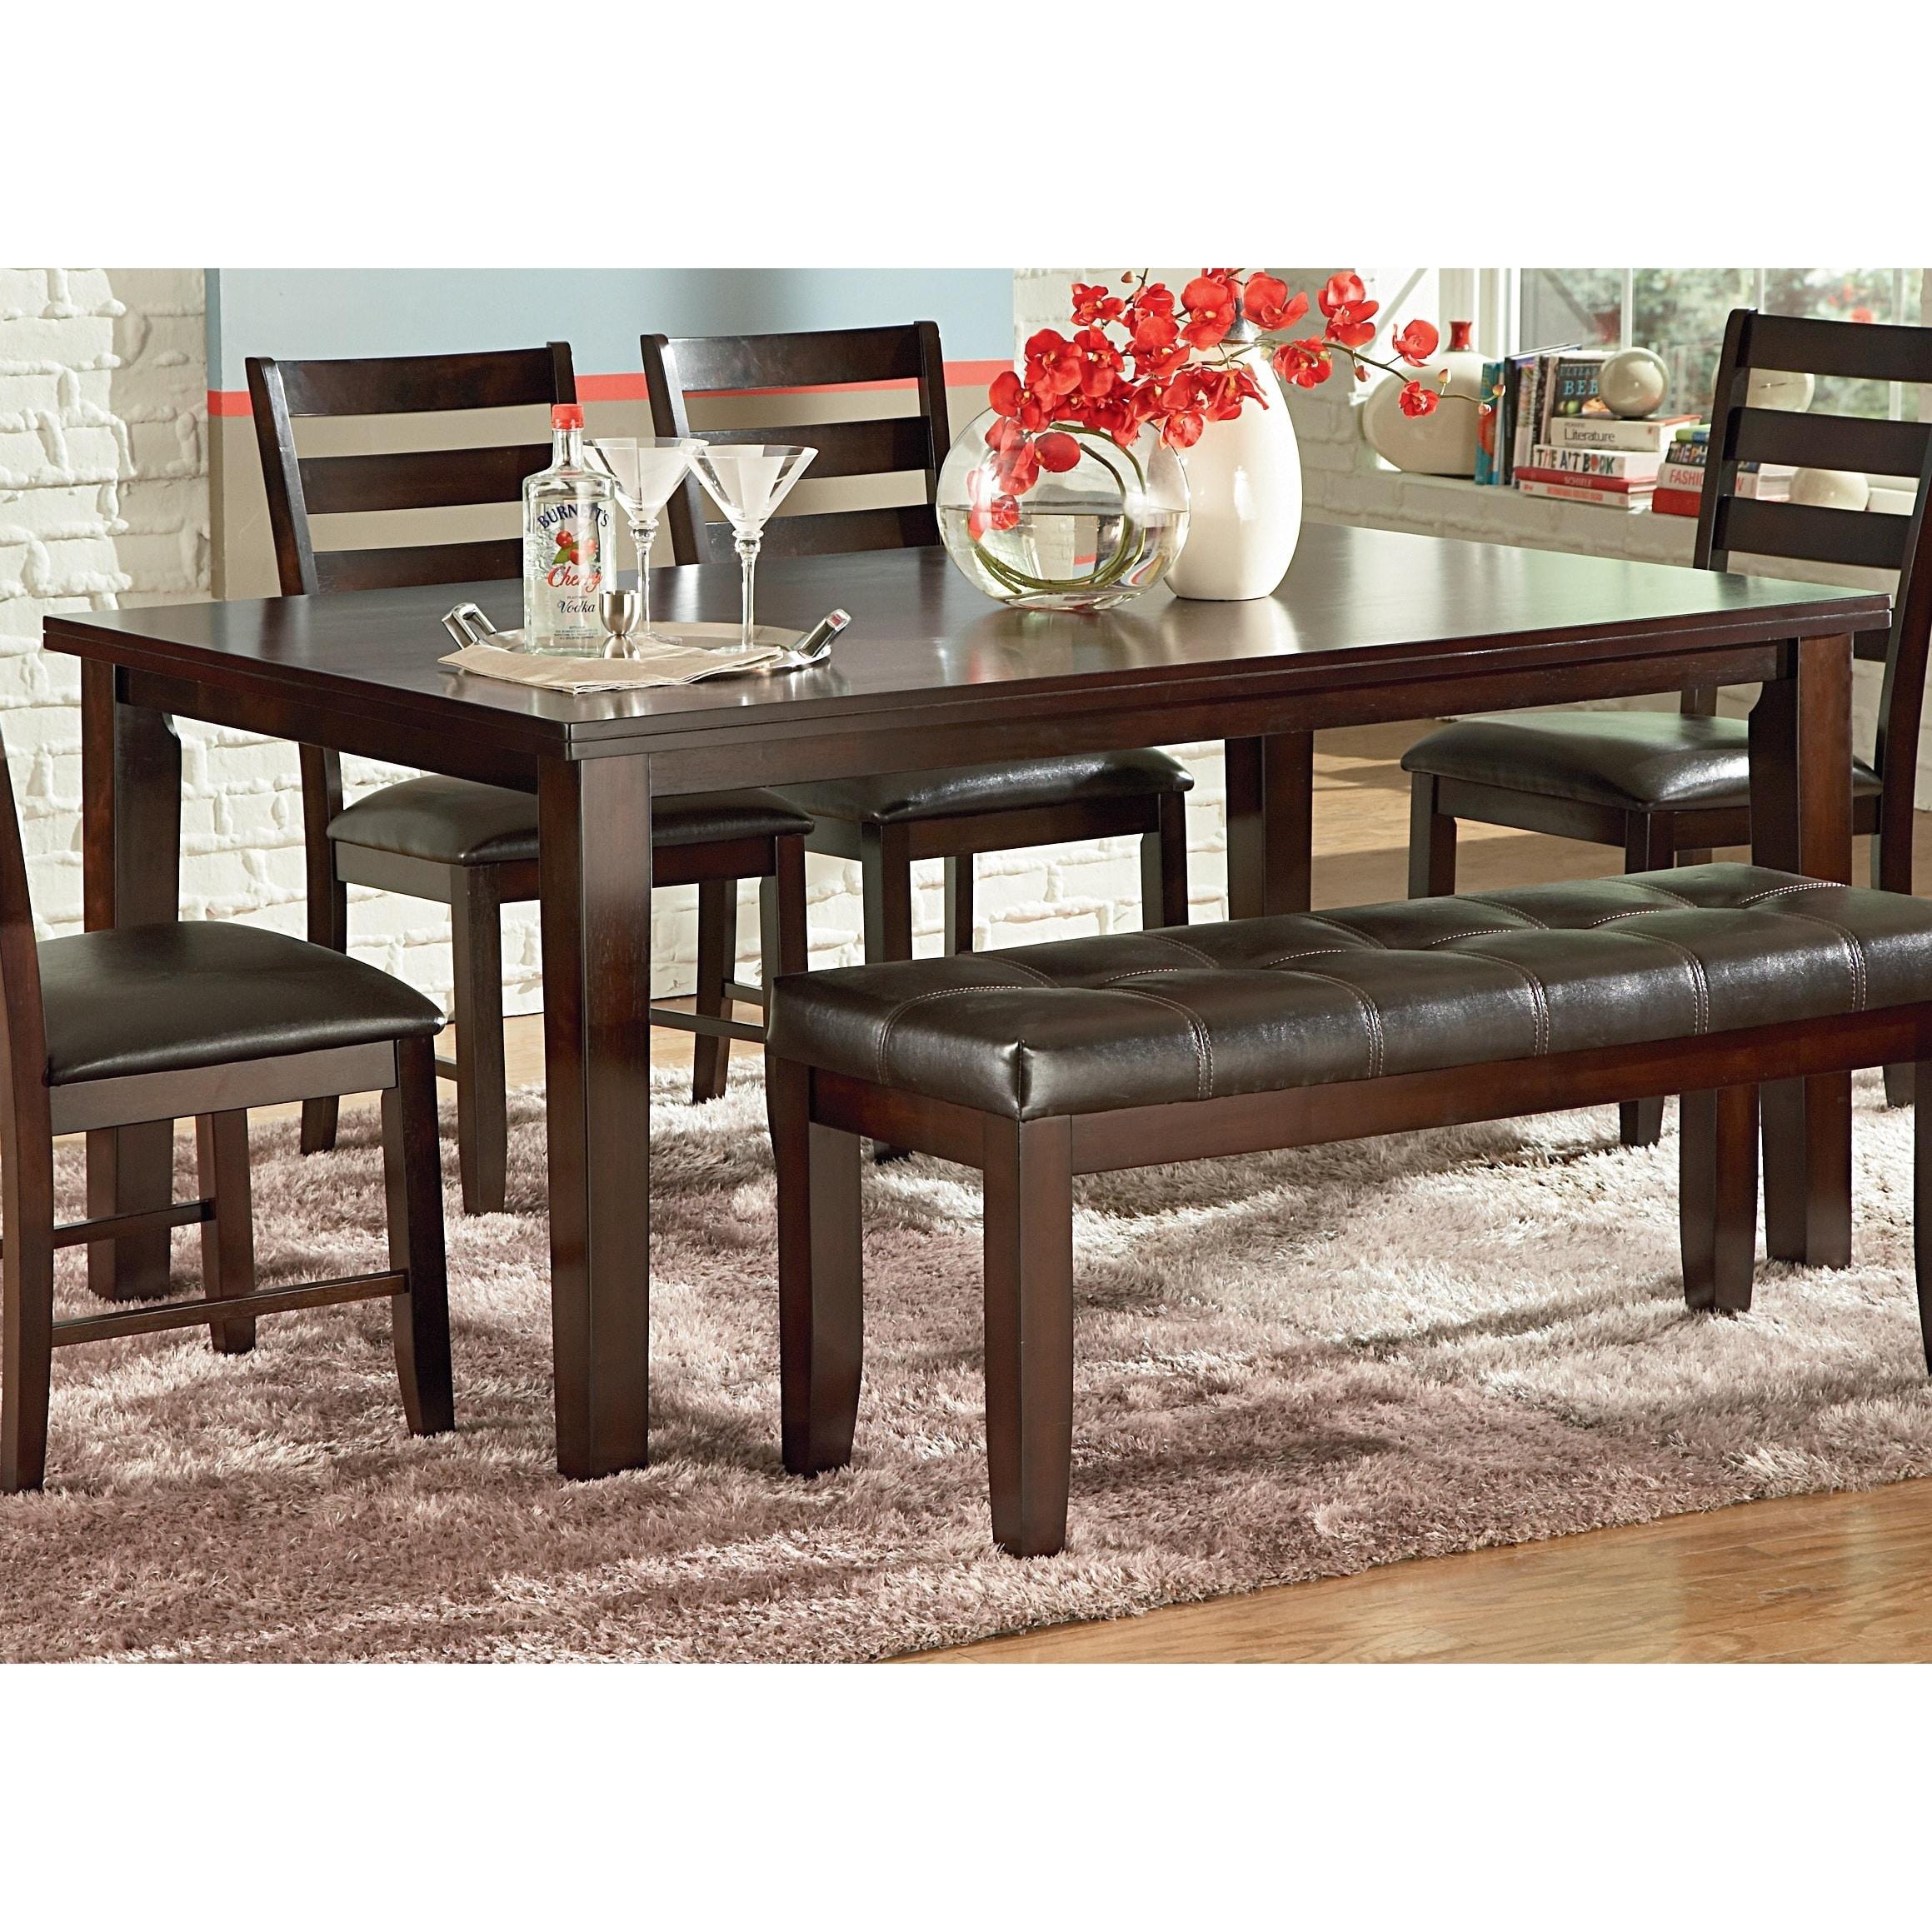 Steve Silver Greyson Living Preston 66 inch Dining Table